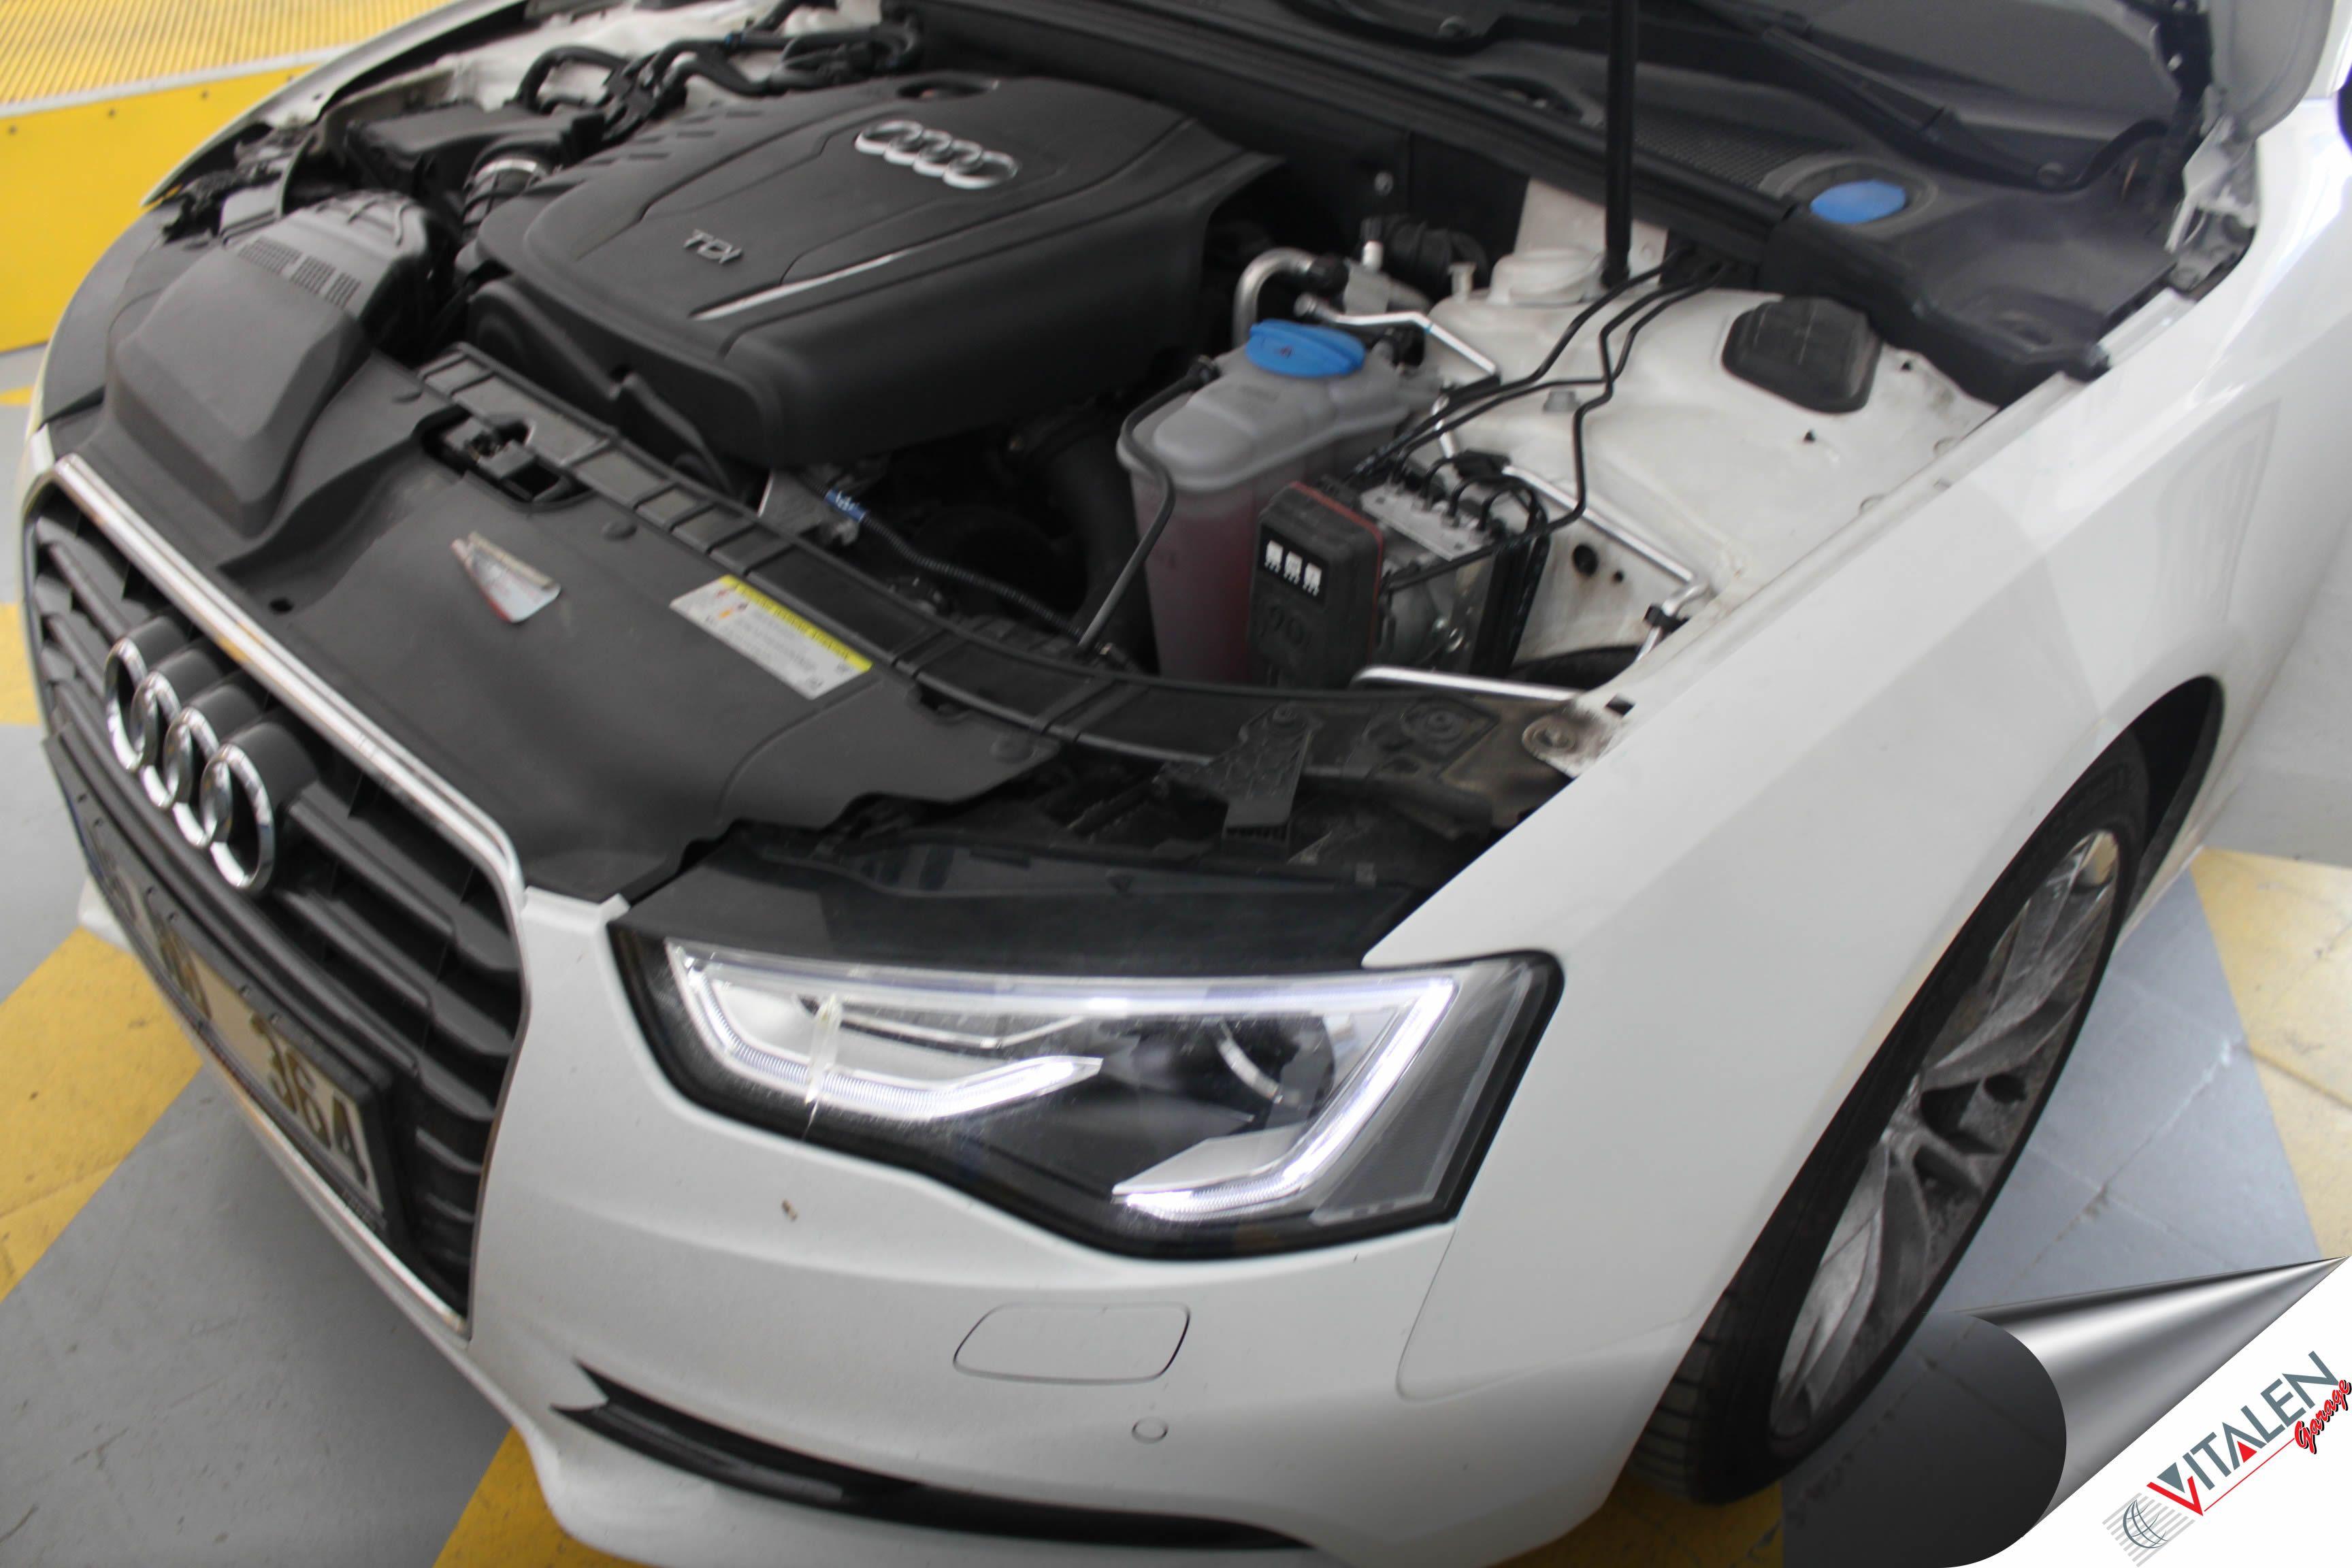 Audi A5 araç sahibi, aracının tepkimesini arttırmak için Pedal Commander, beygirini arttırmak için ise Chiptuning06 uygulamasını seçti. / Pedal Commander is a throttle position controller it helps your engine response faster and your can car accelerate faster.Up to 30% more HP and up to 25% more torque, Up to 15% less fuel consumption.